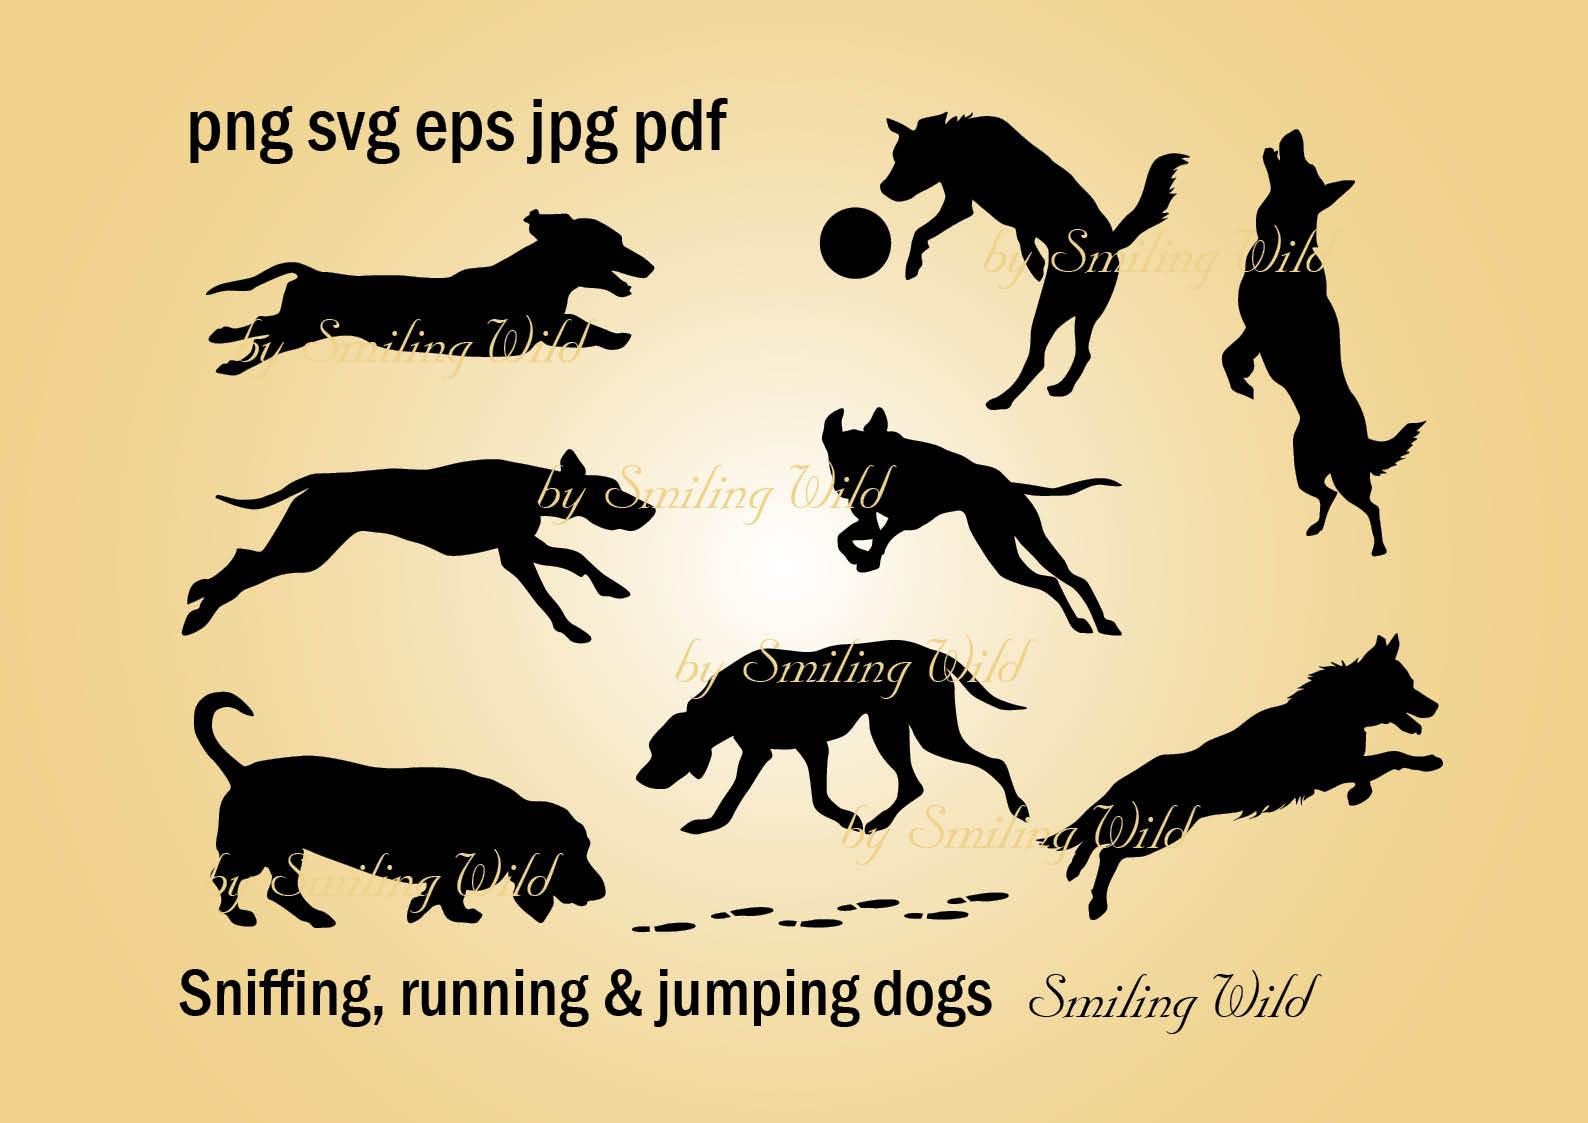 sniffing dog bloodhound svg silhouette running dog clipart art jumping dog  vector graphic printable running shepherd dachshund.